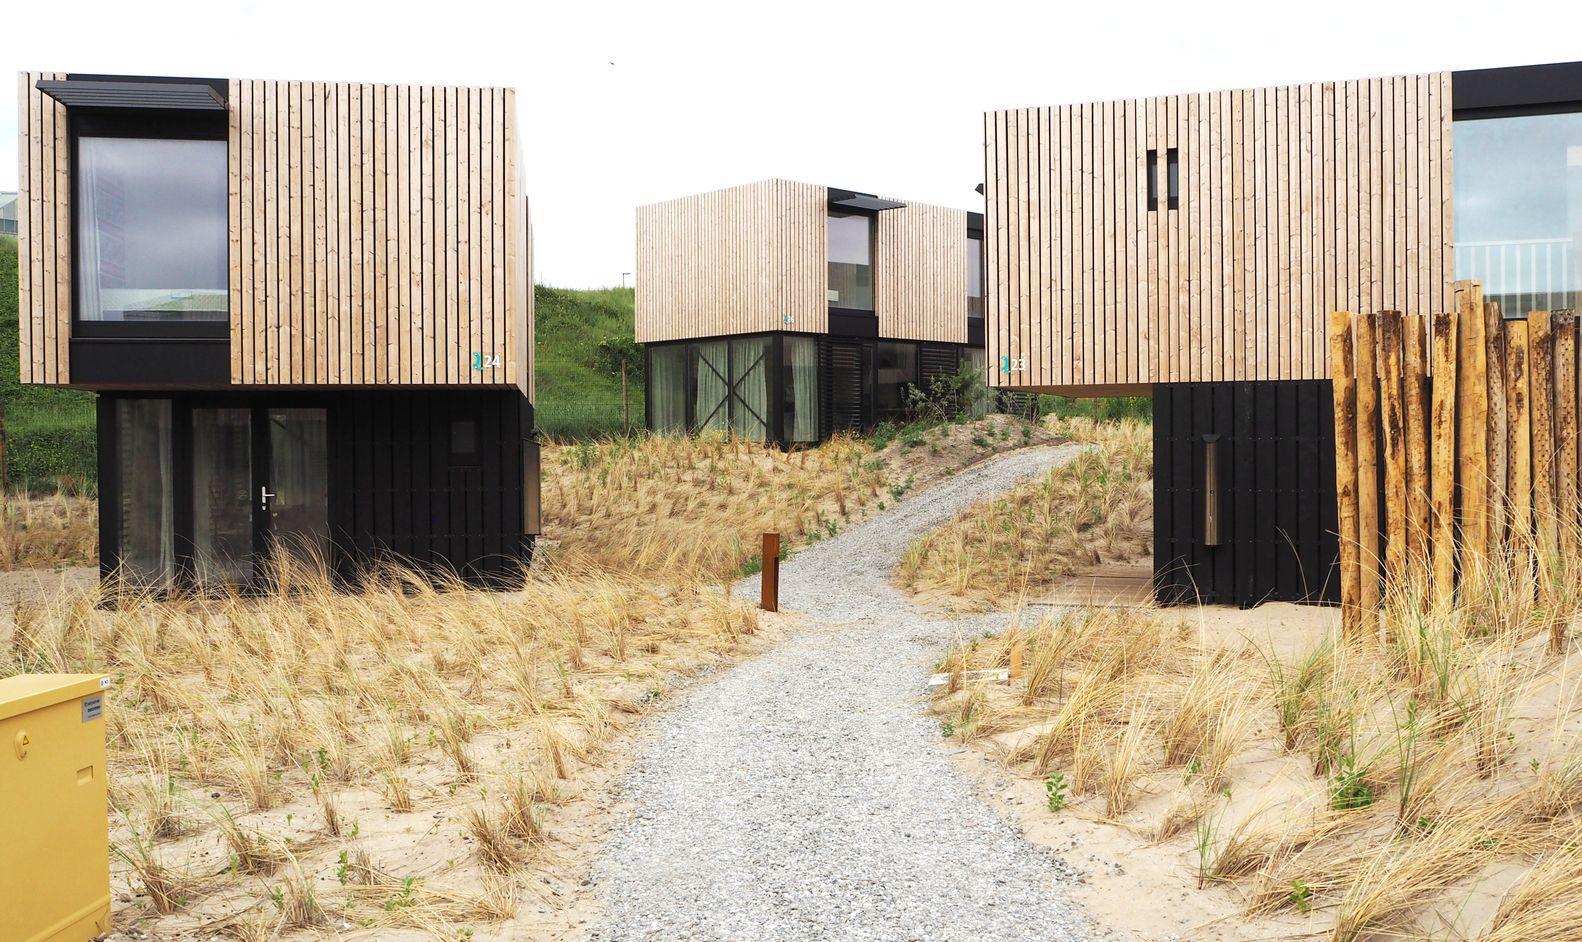 Gallery Of Qurios Zandvoort 2by4 Architects 1 Architect